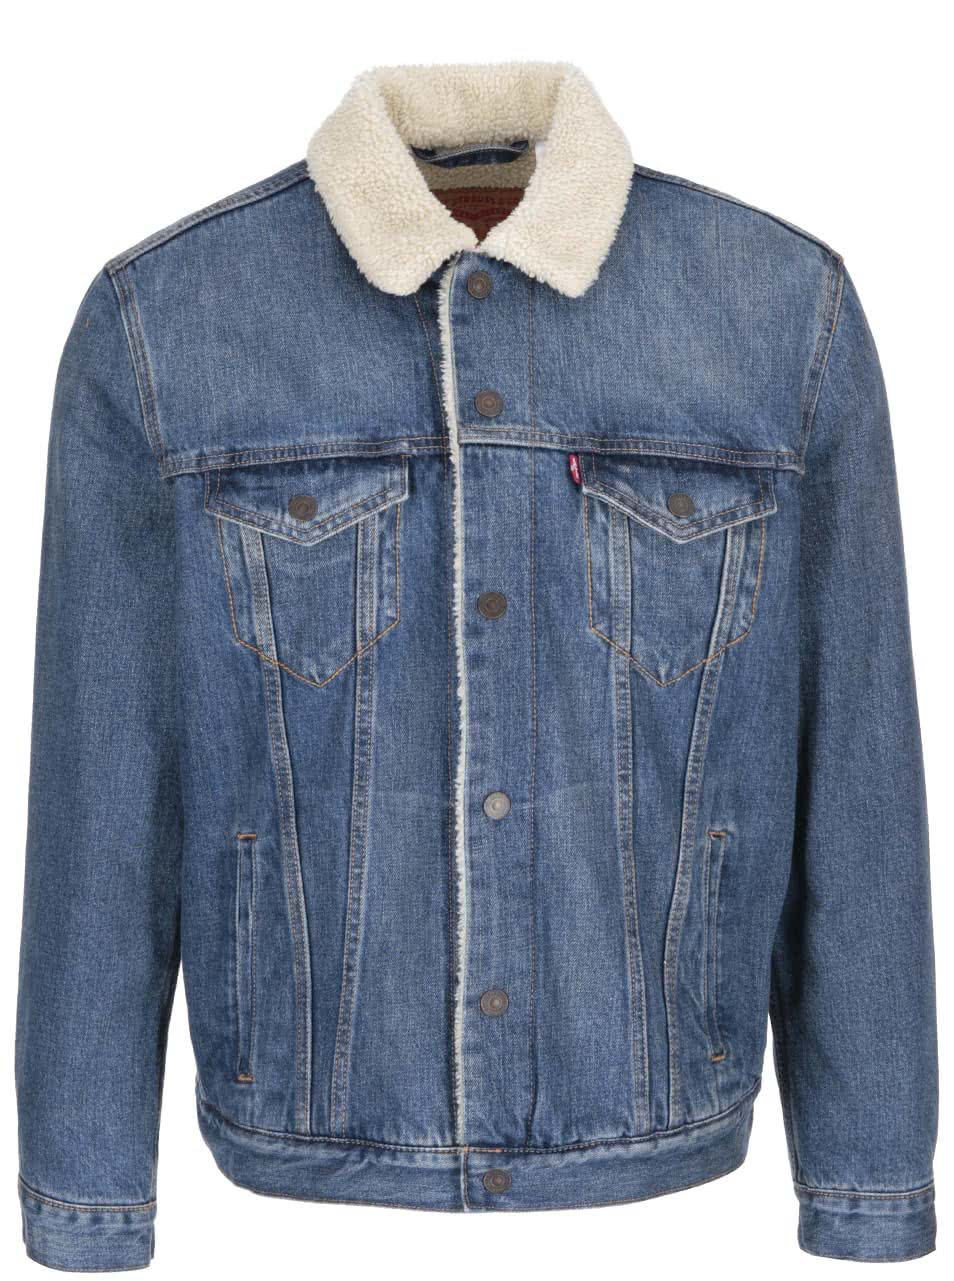 Modrá pánska rifľová bunda Levi s® ... 3fcb97629b2